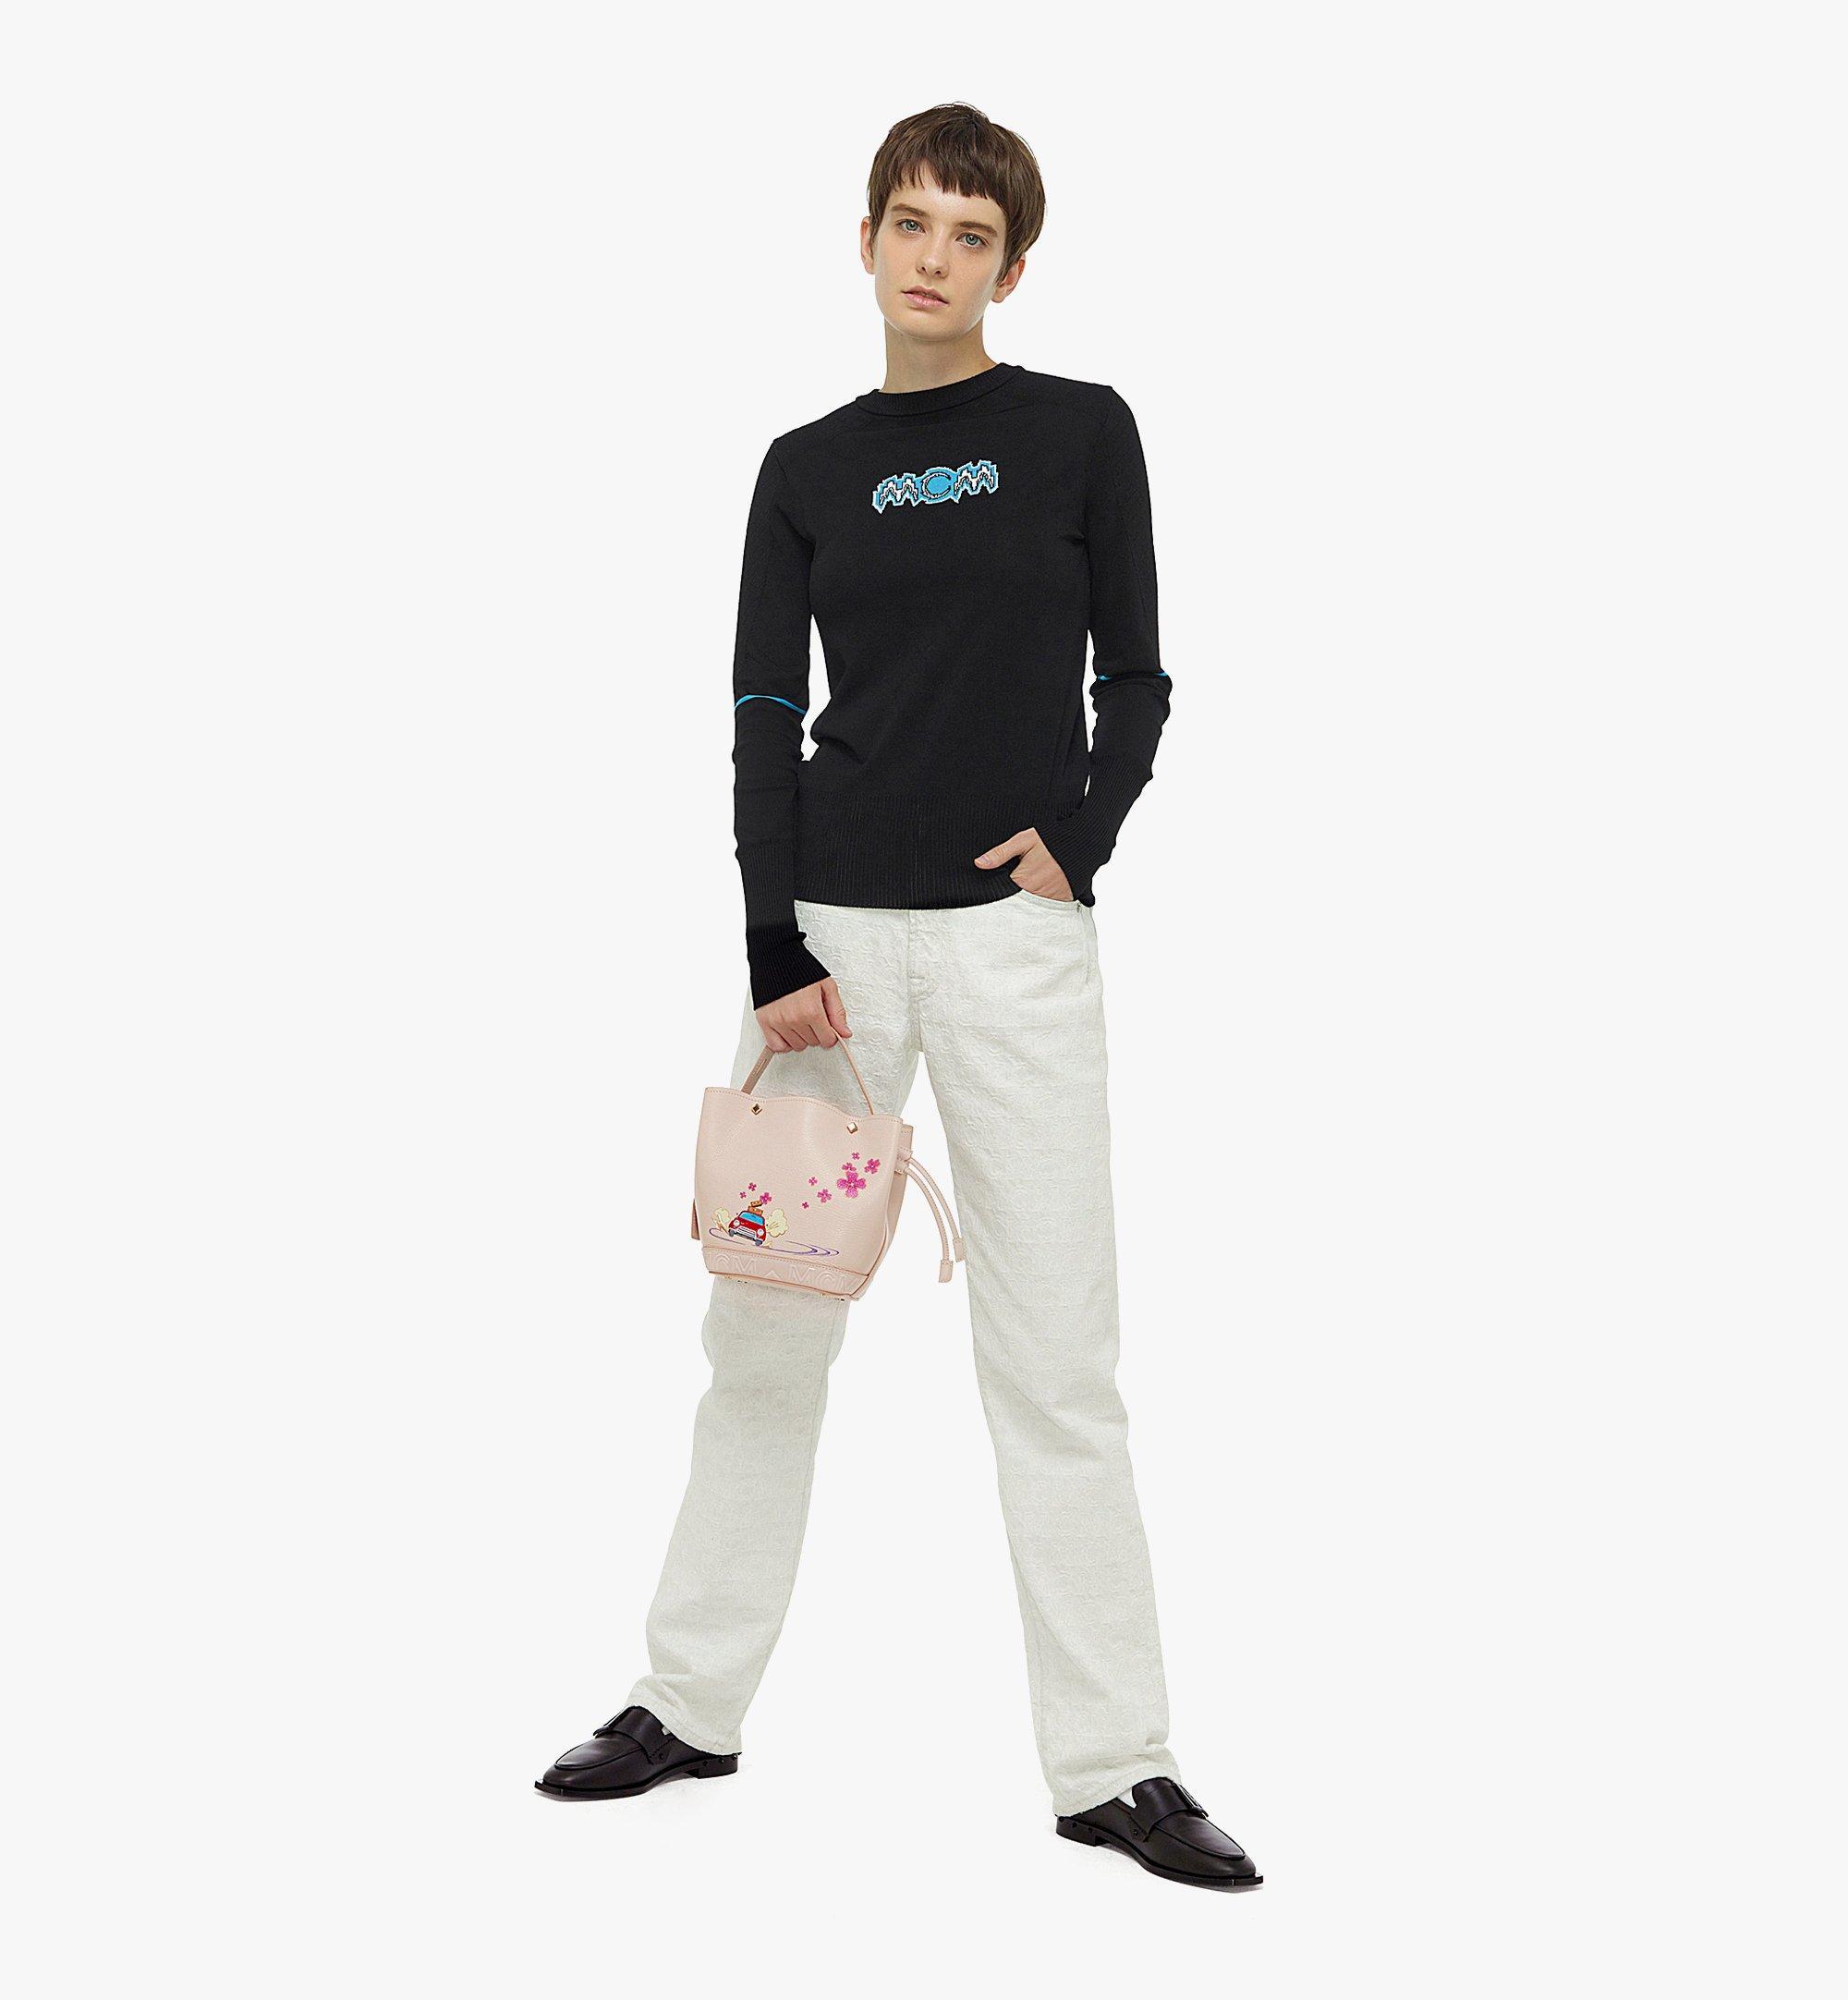 MCM MCM x HYUN-WOONG PARK Milano Drawstring Bag Pink MWDBSUP01IH001 Alternate View 3